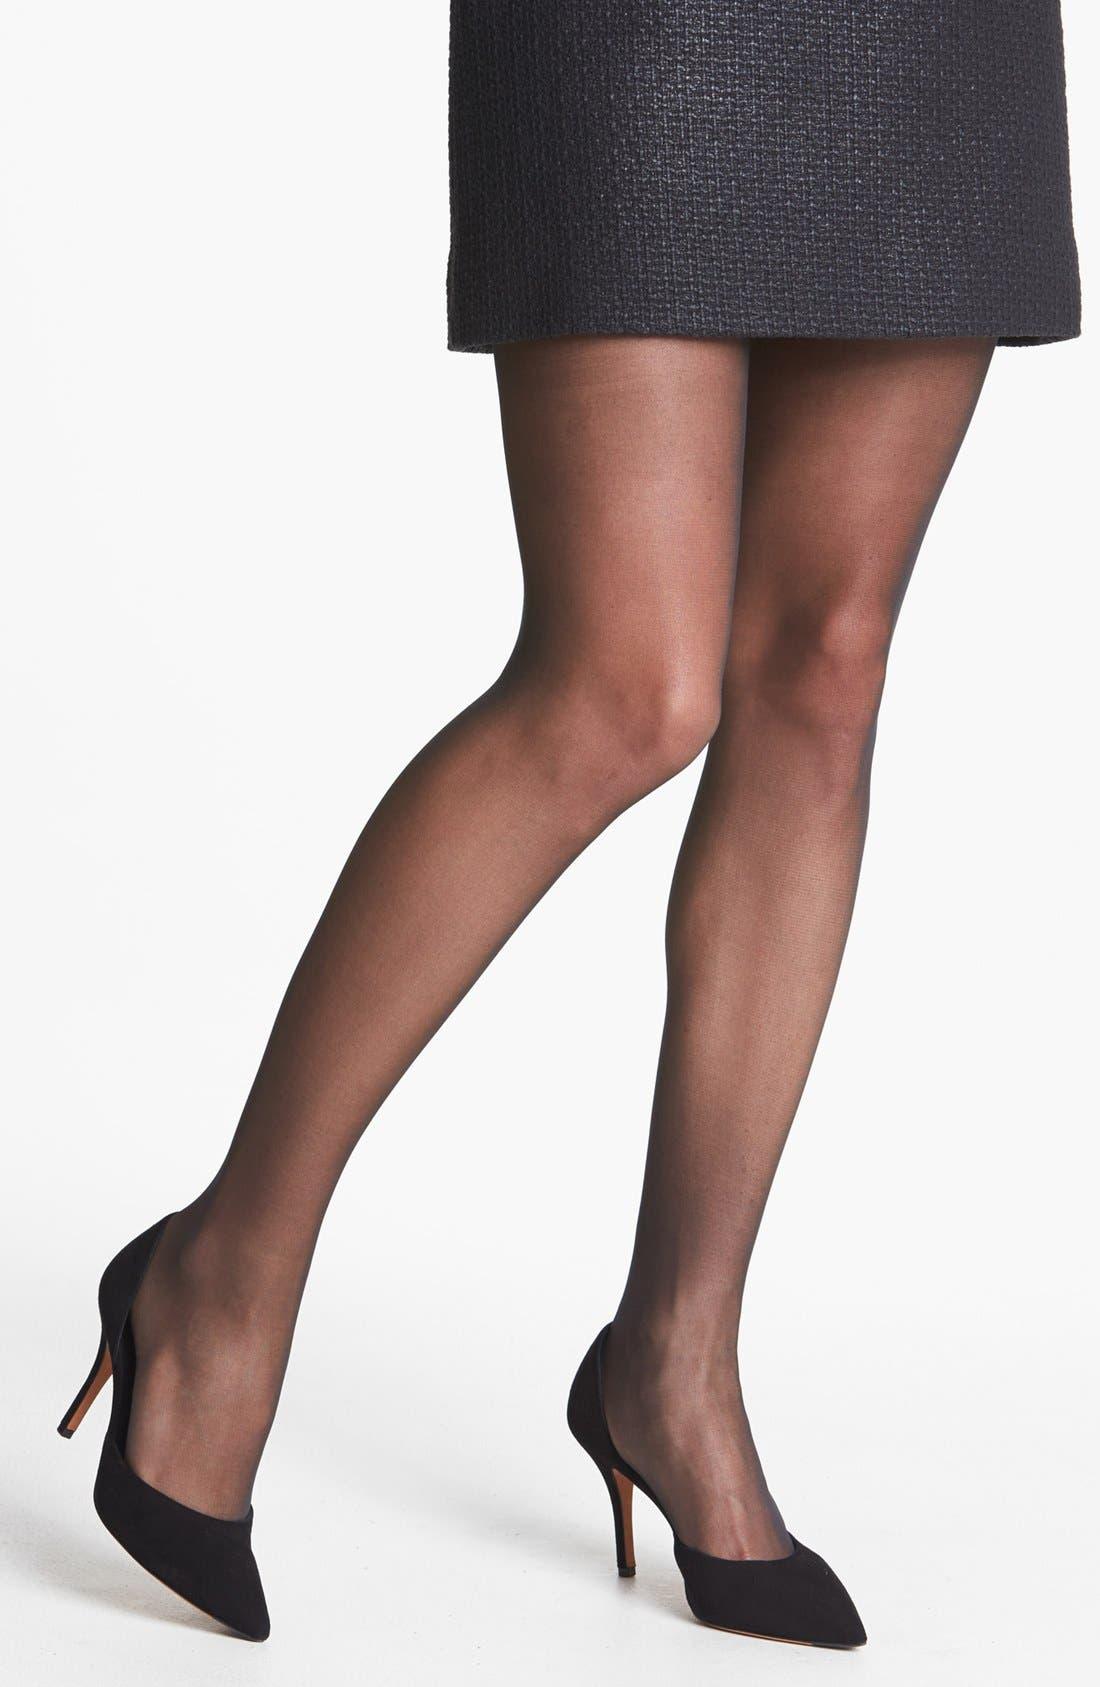 Alternate Image 1 Selected - DKNY Lowrise Girlshort Control Top Pantyhose